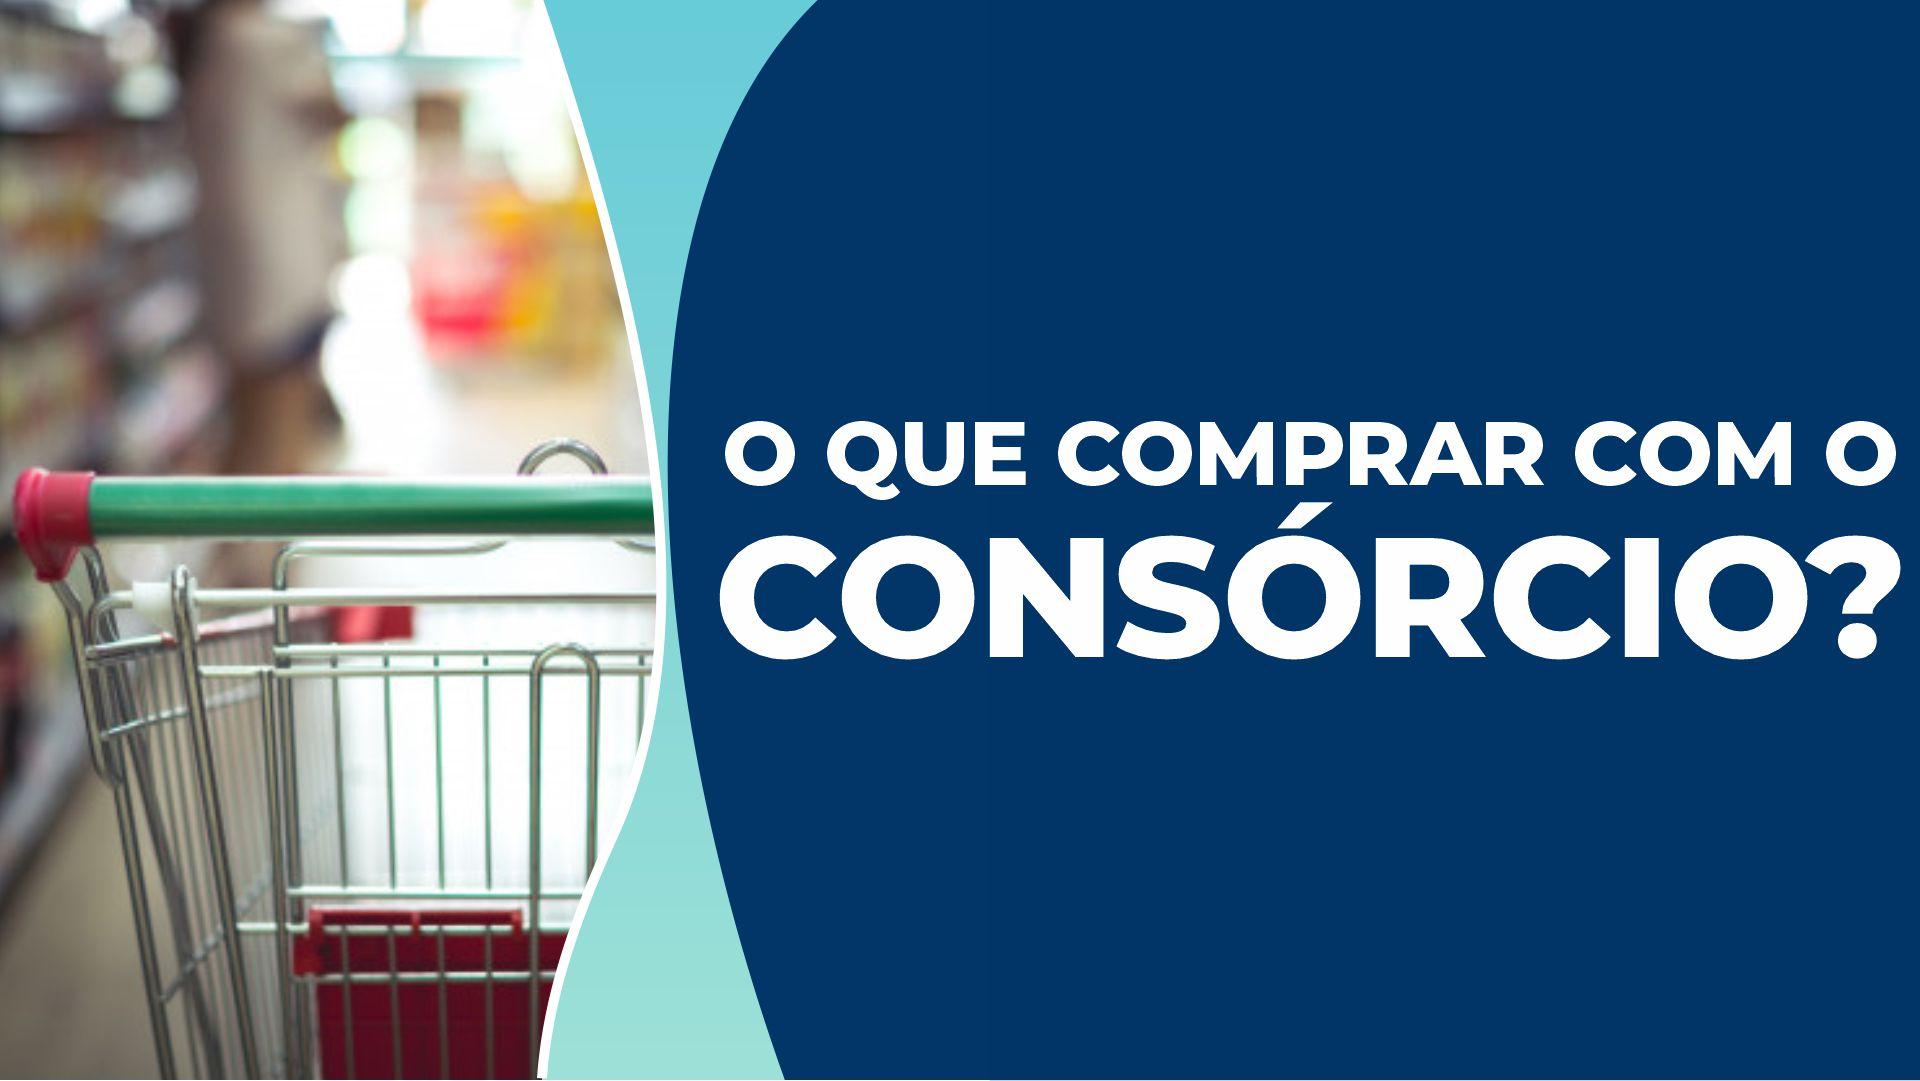 O que comprar com o consórcio? Entenda todas as possibilidades!